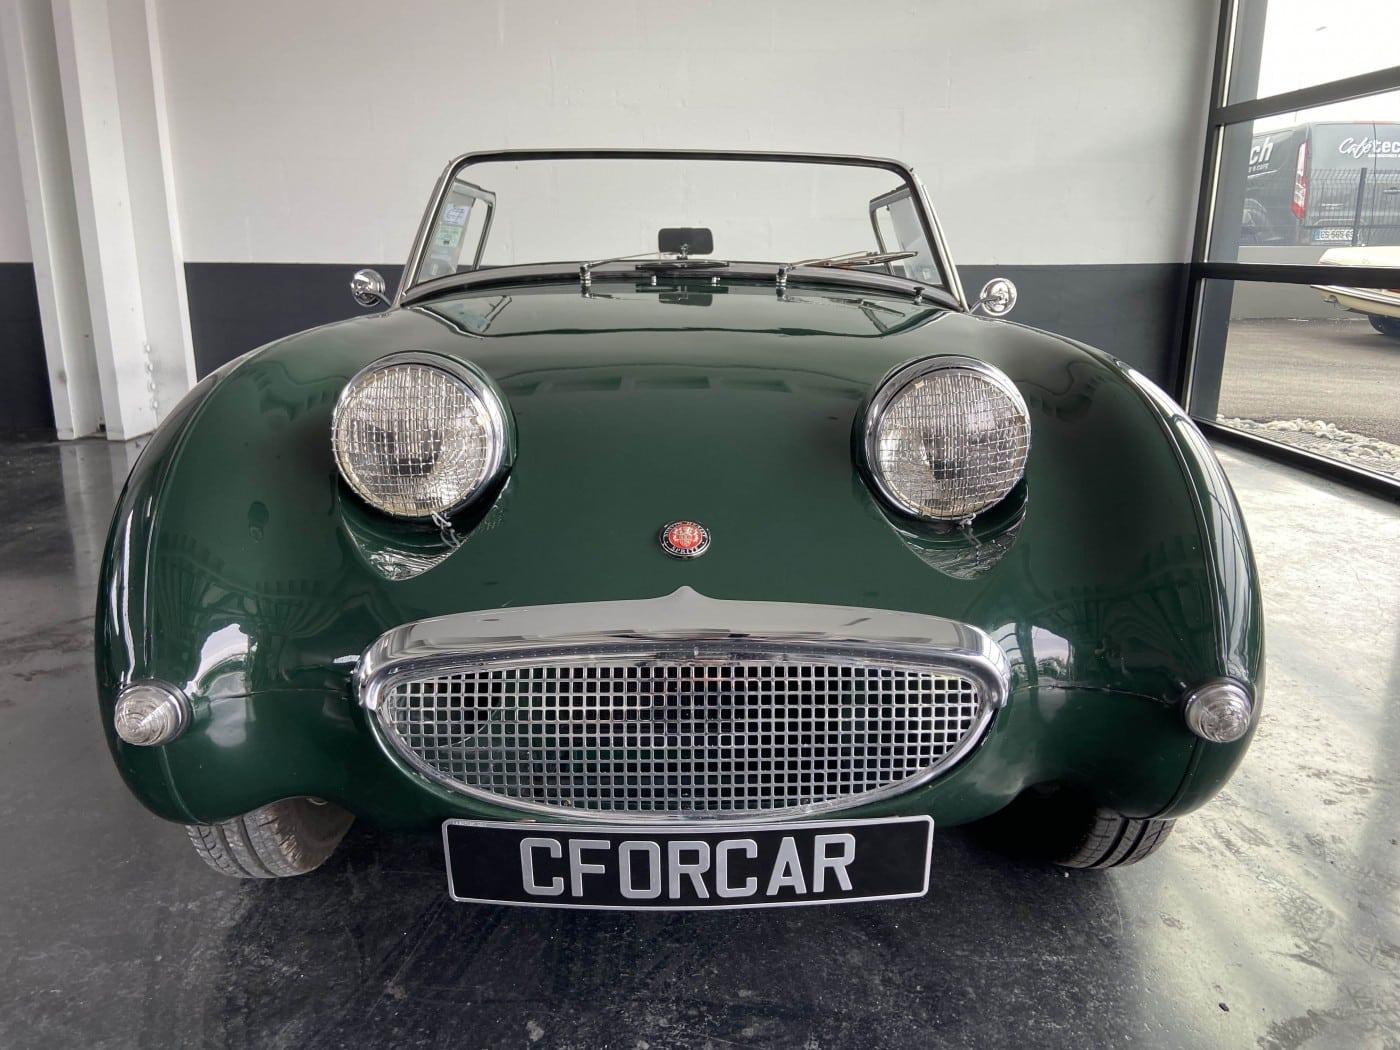 voiture-ancienne-cforcar-austin-frogeye-vhc-26